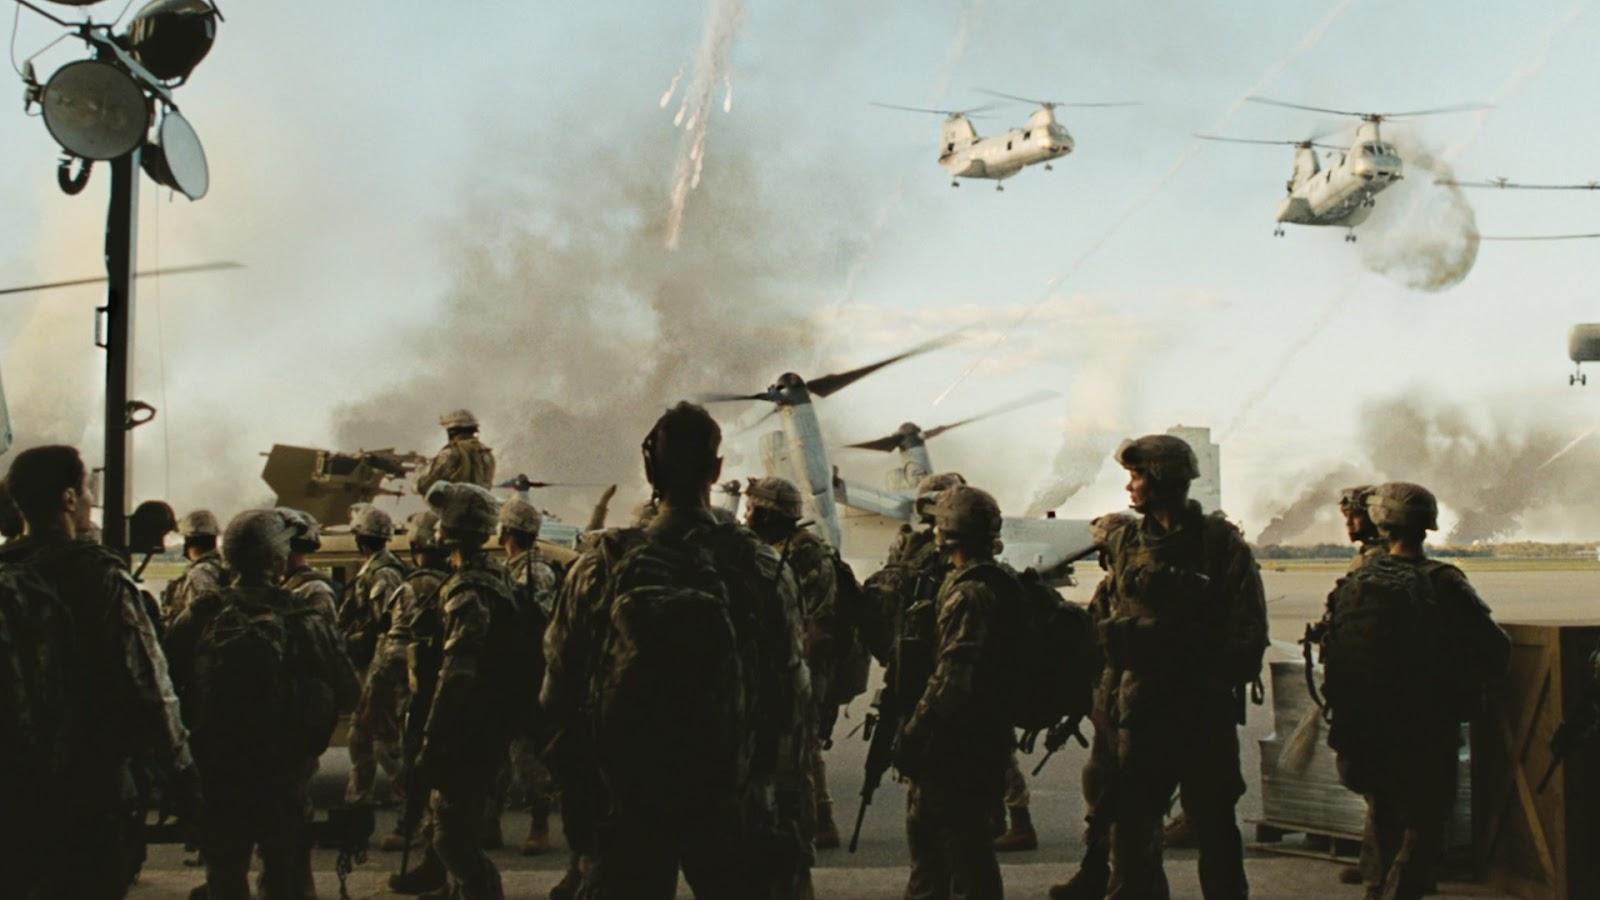 Battle Los Angeles in Full HD Wallpapers  1080p Wallpaper Store 1600x900